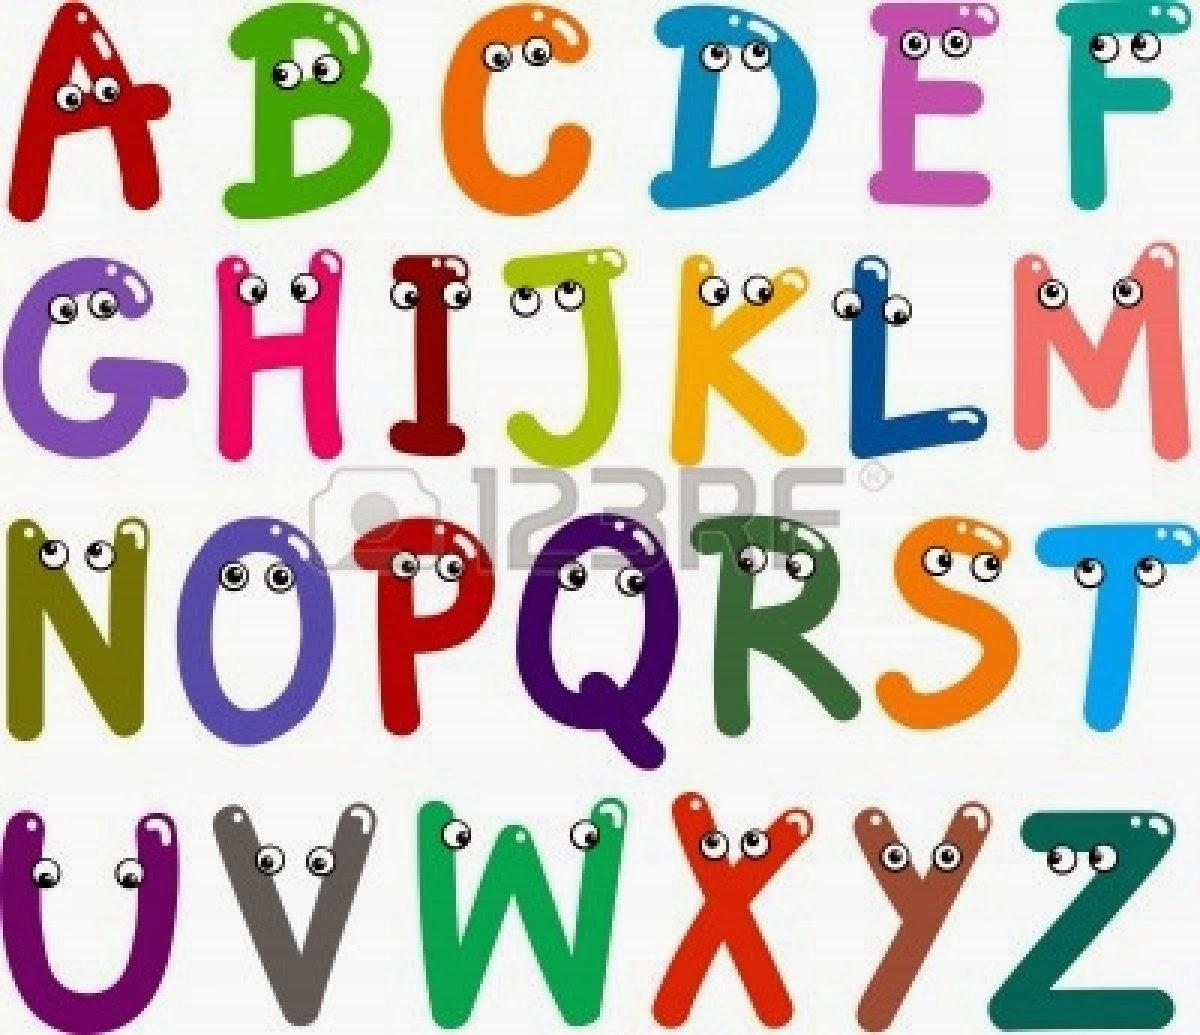 Spelling alphabet  Wikipedia